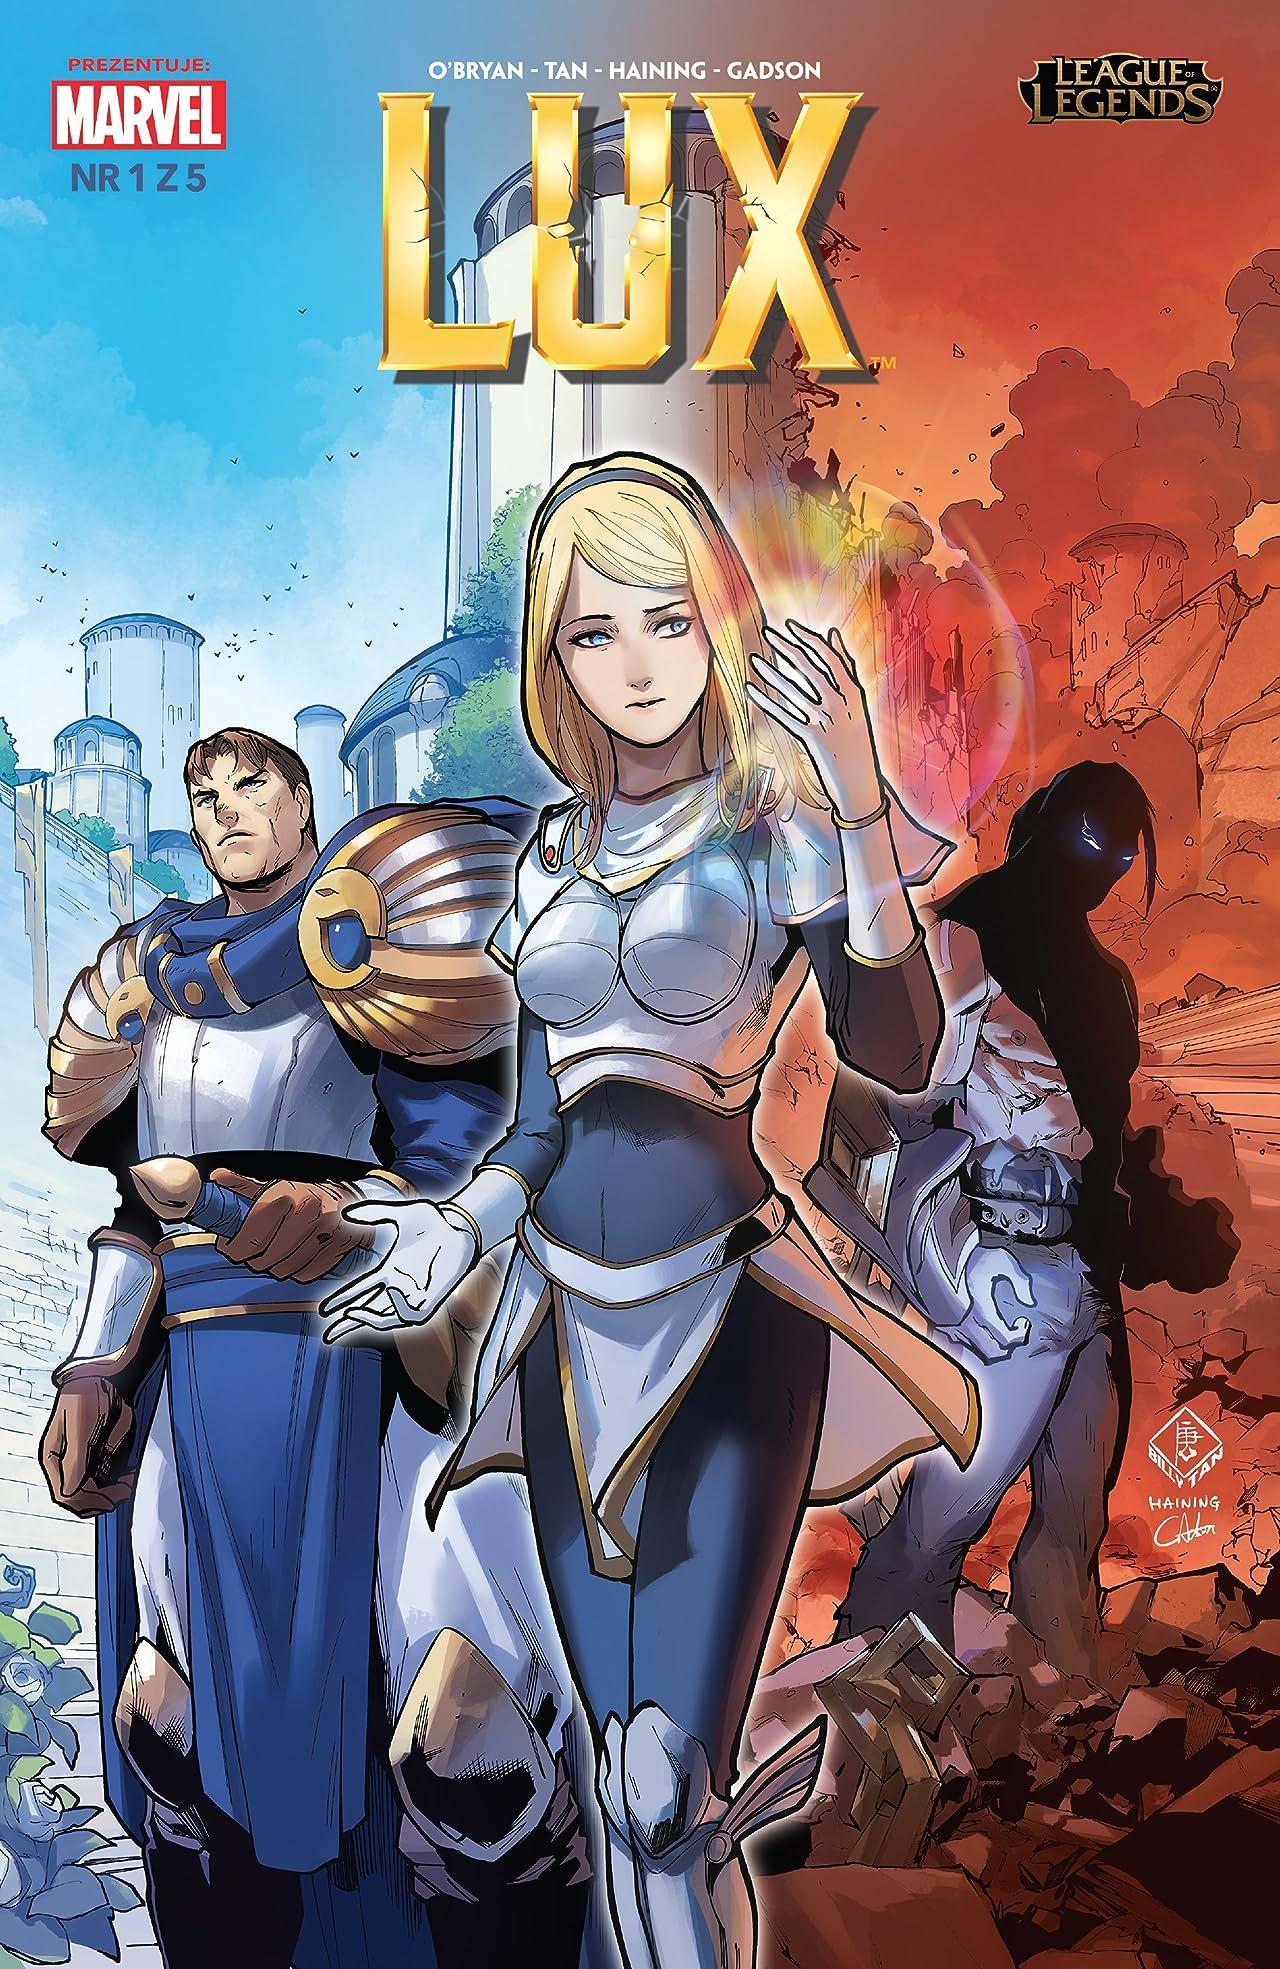 League Of Legends: Lux (Polish) #1 (of 5)